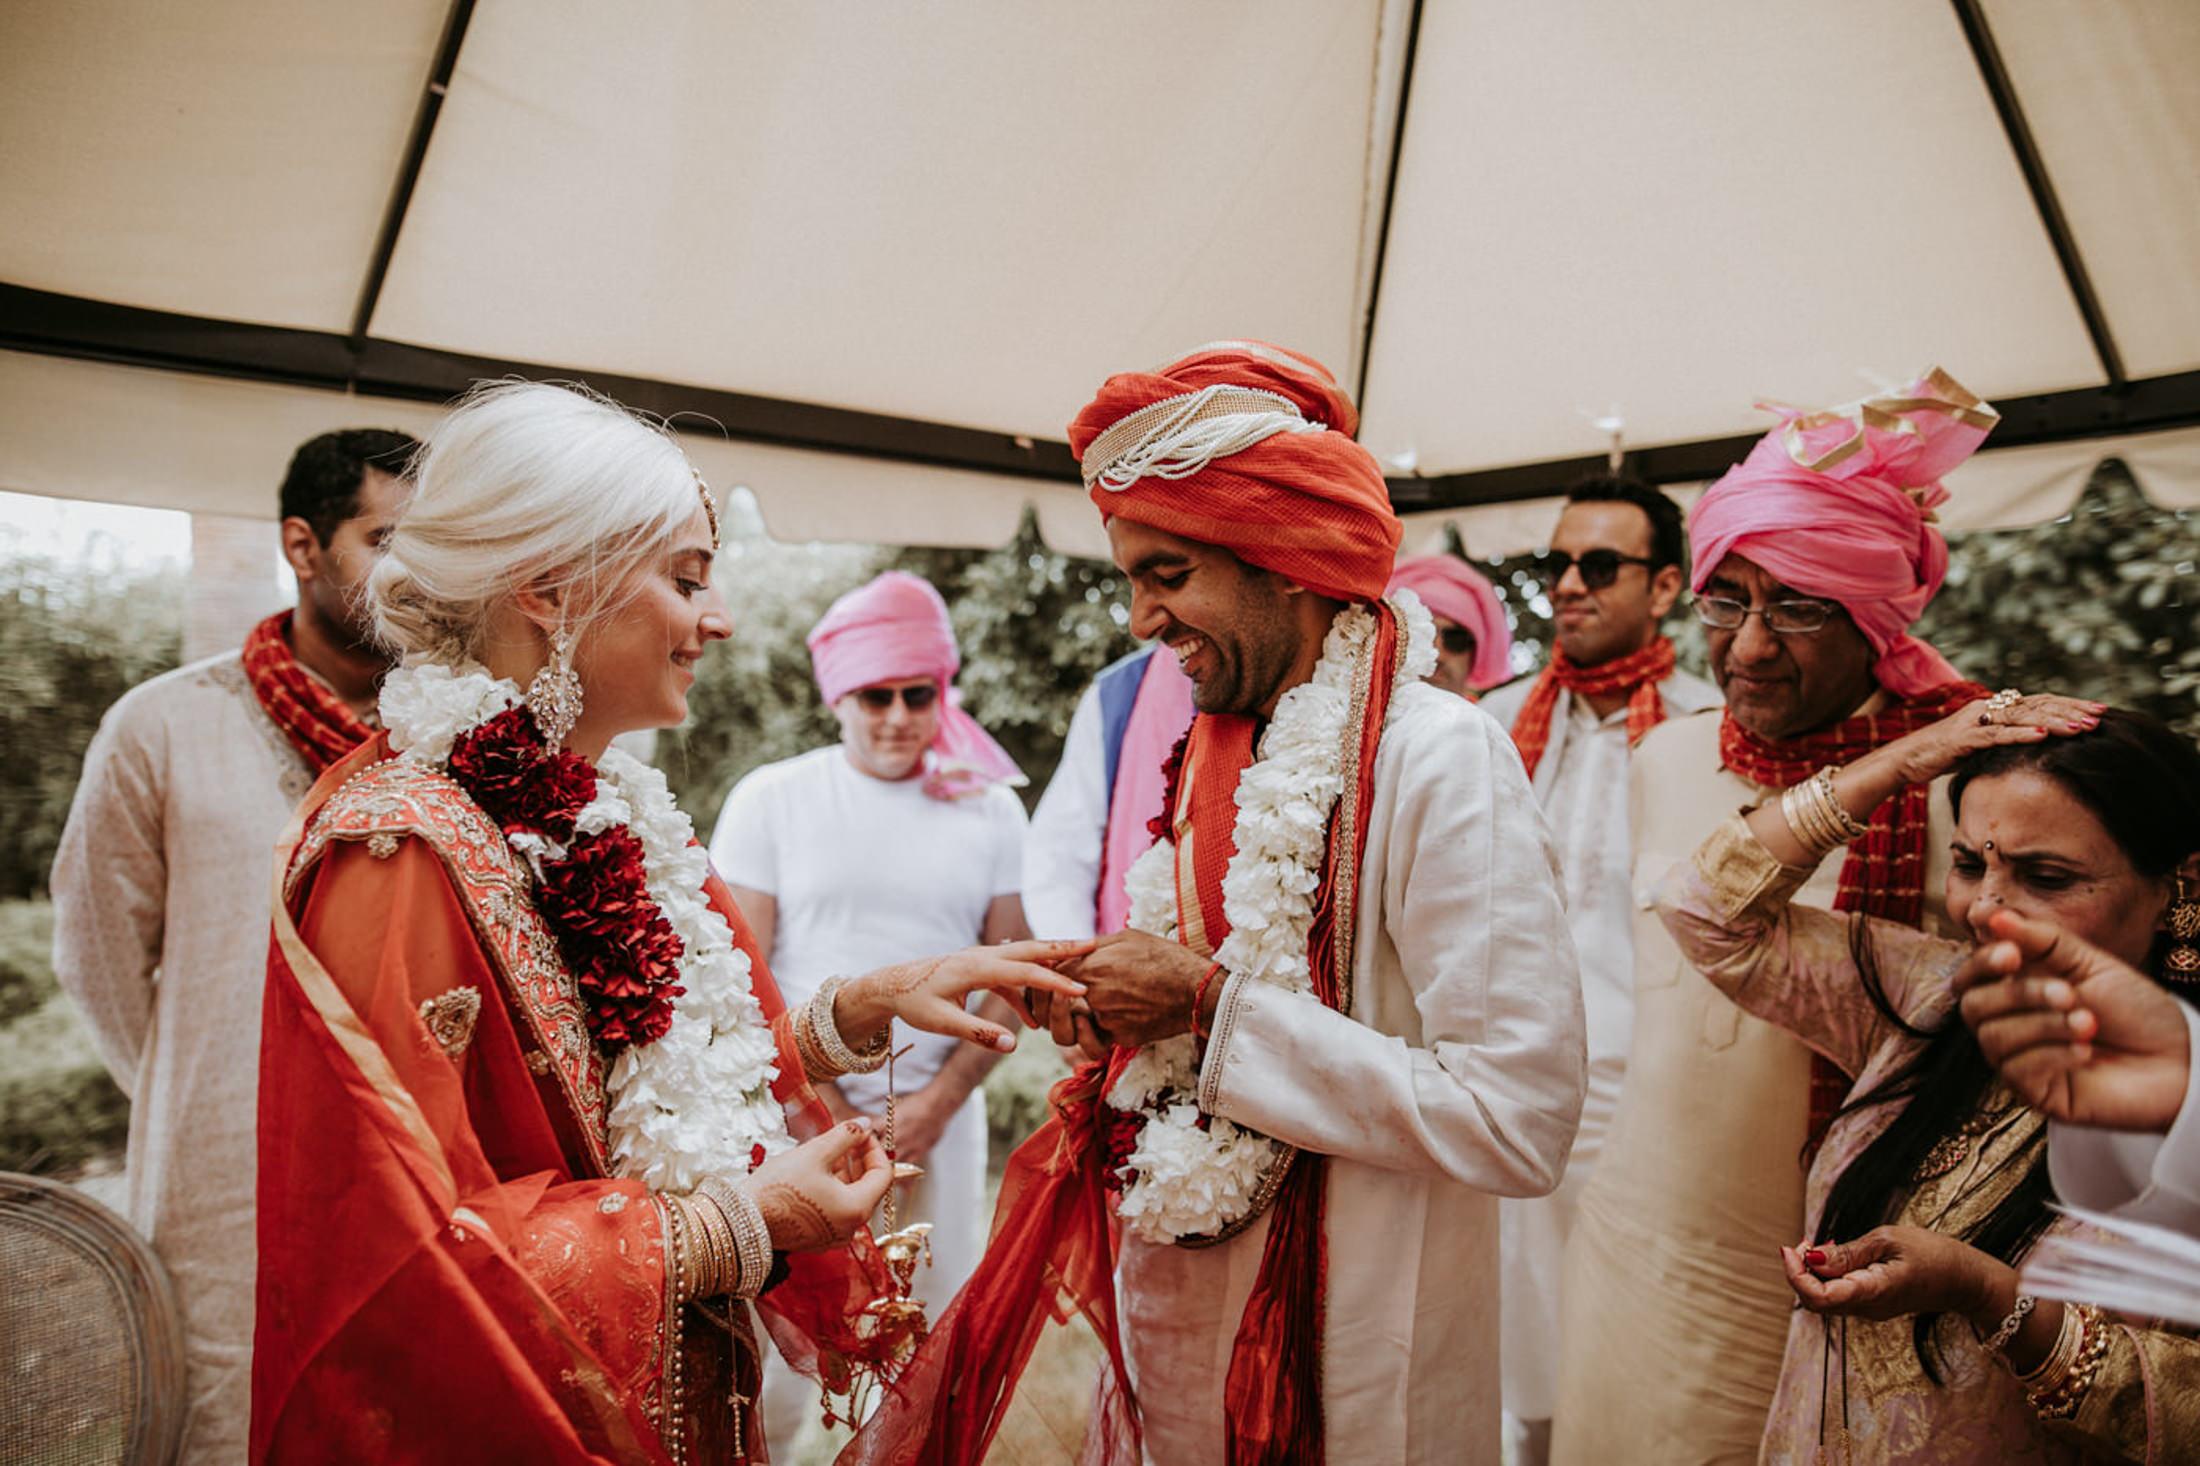 Wedding_Photographer_Mallorca_Daniela-Marquardt_Photography_New_York_Iceland_Tuscany_Santorini_Portugal_Austria_Bavaria_Elopement_Hochzeitsfotograf_AntjeRajat2_52